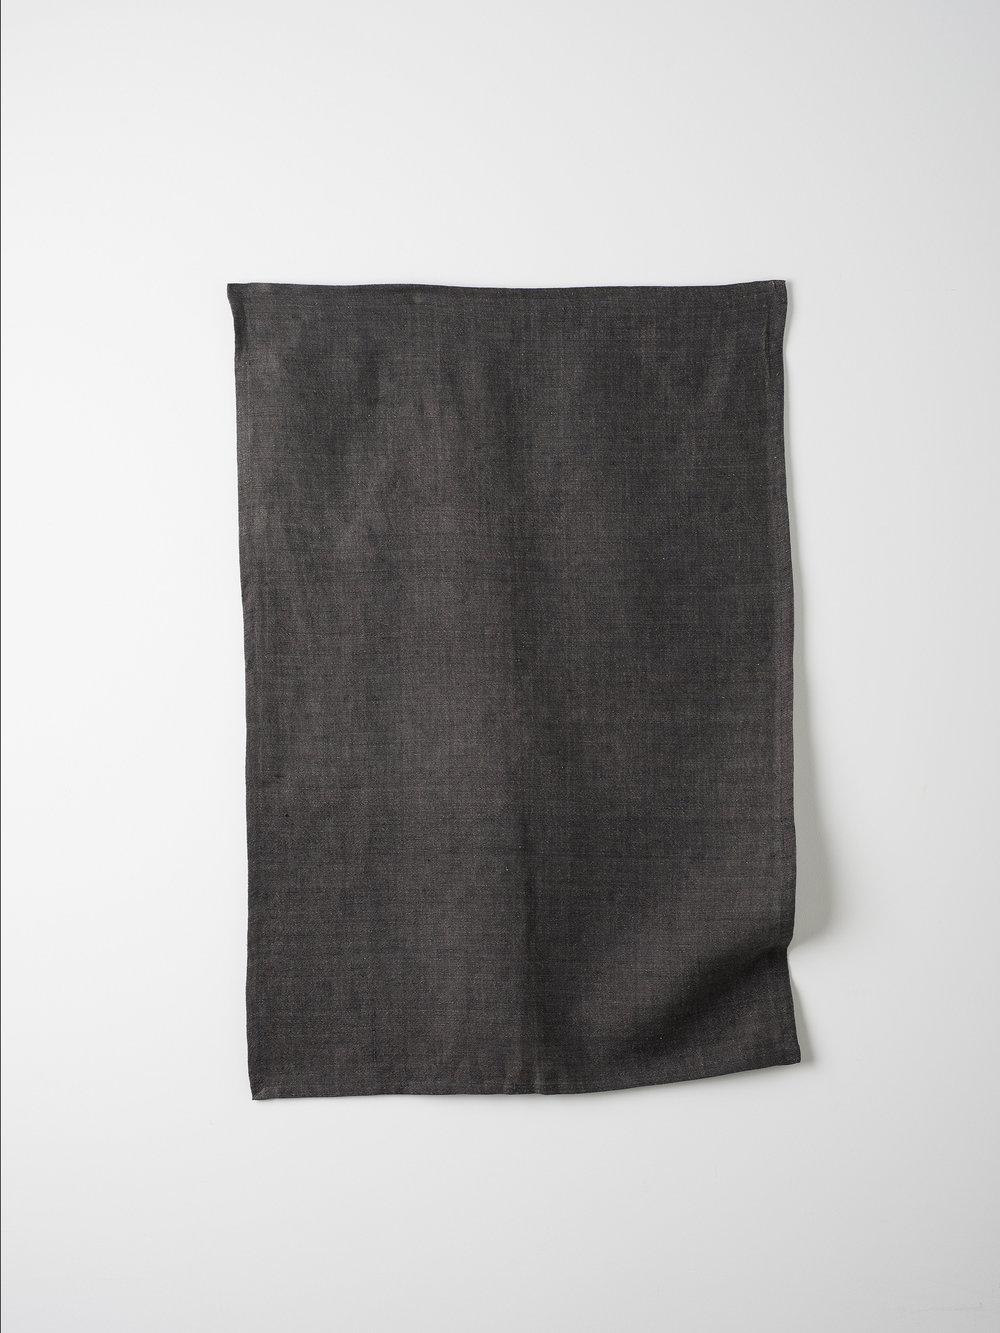 Hand Woven  Tea Towel $29.90